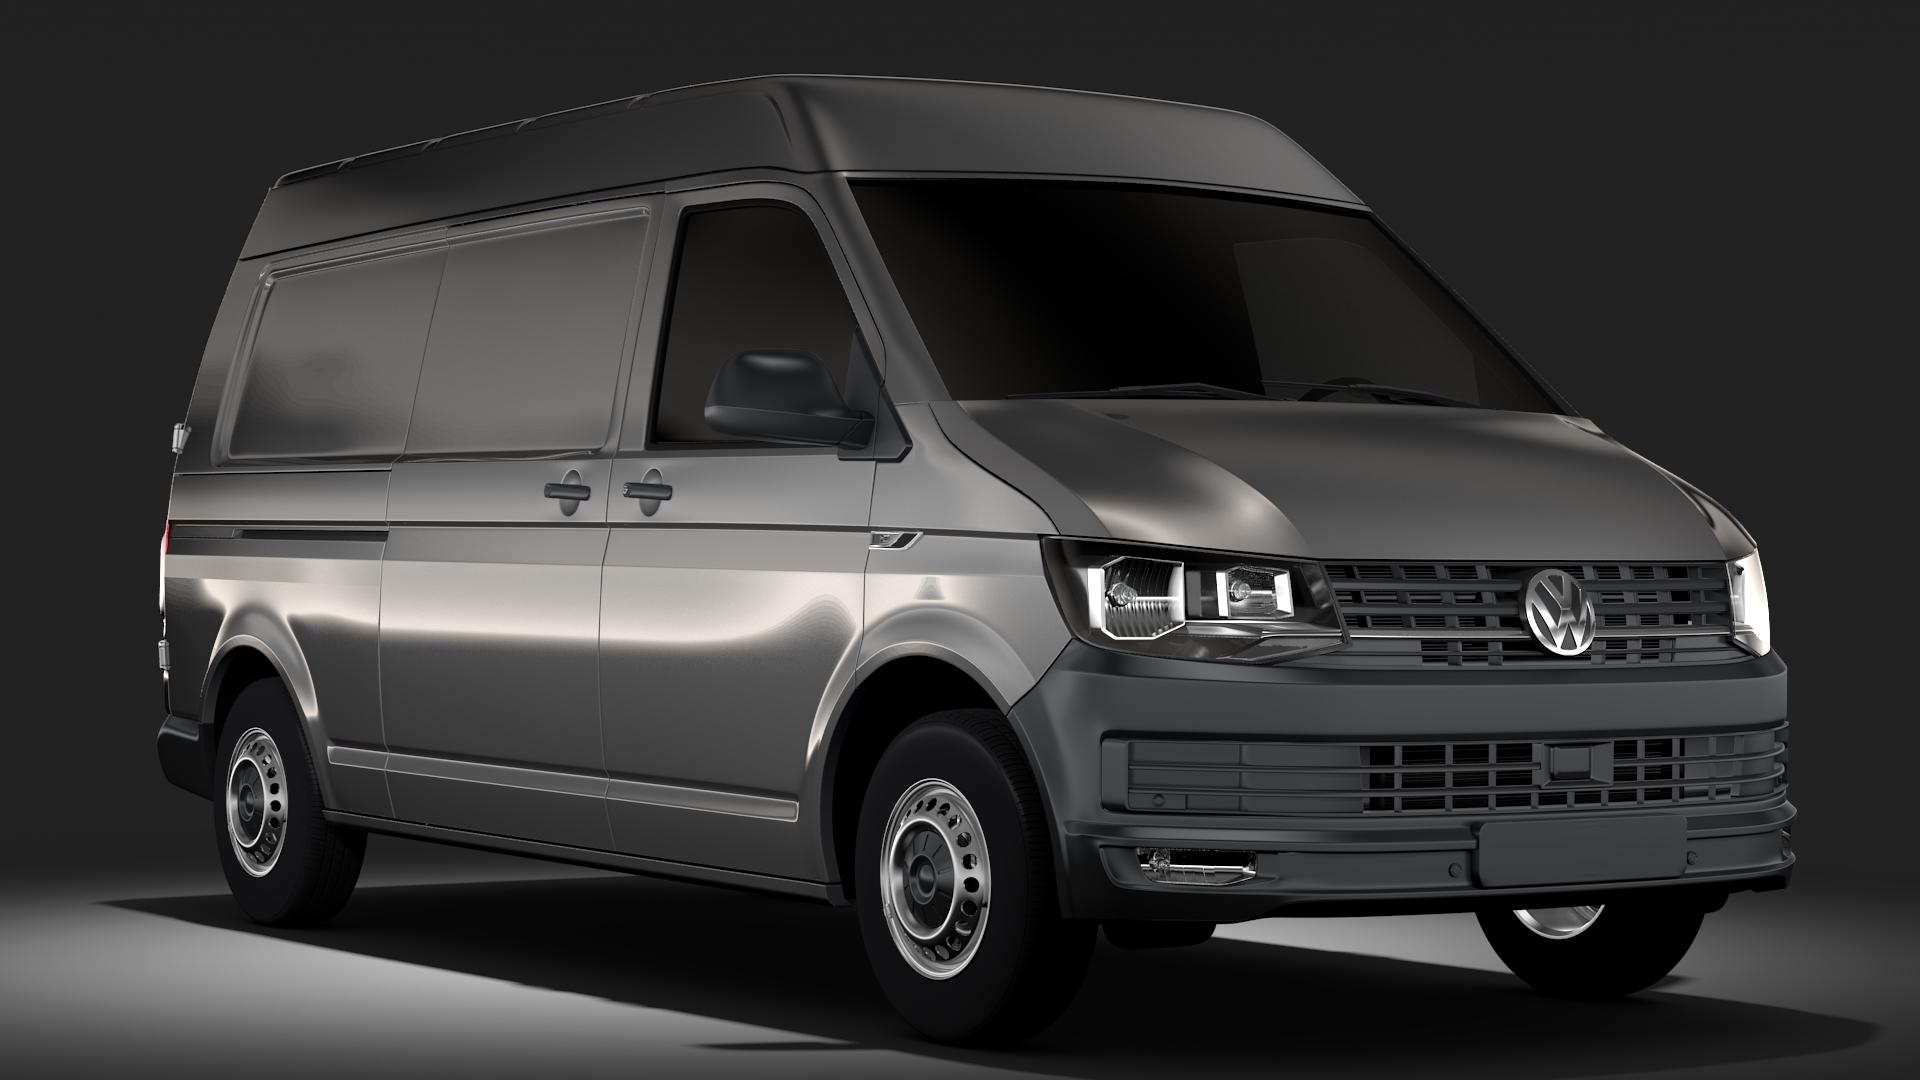 volkswagen transporter van l2h2 t6 2017 3d model flatpyramid. Black Bedroom Furniture Sets. Home Design Ideas